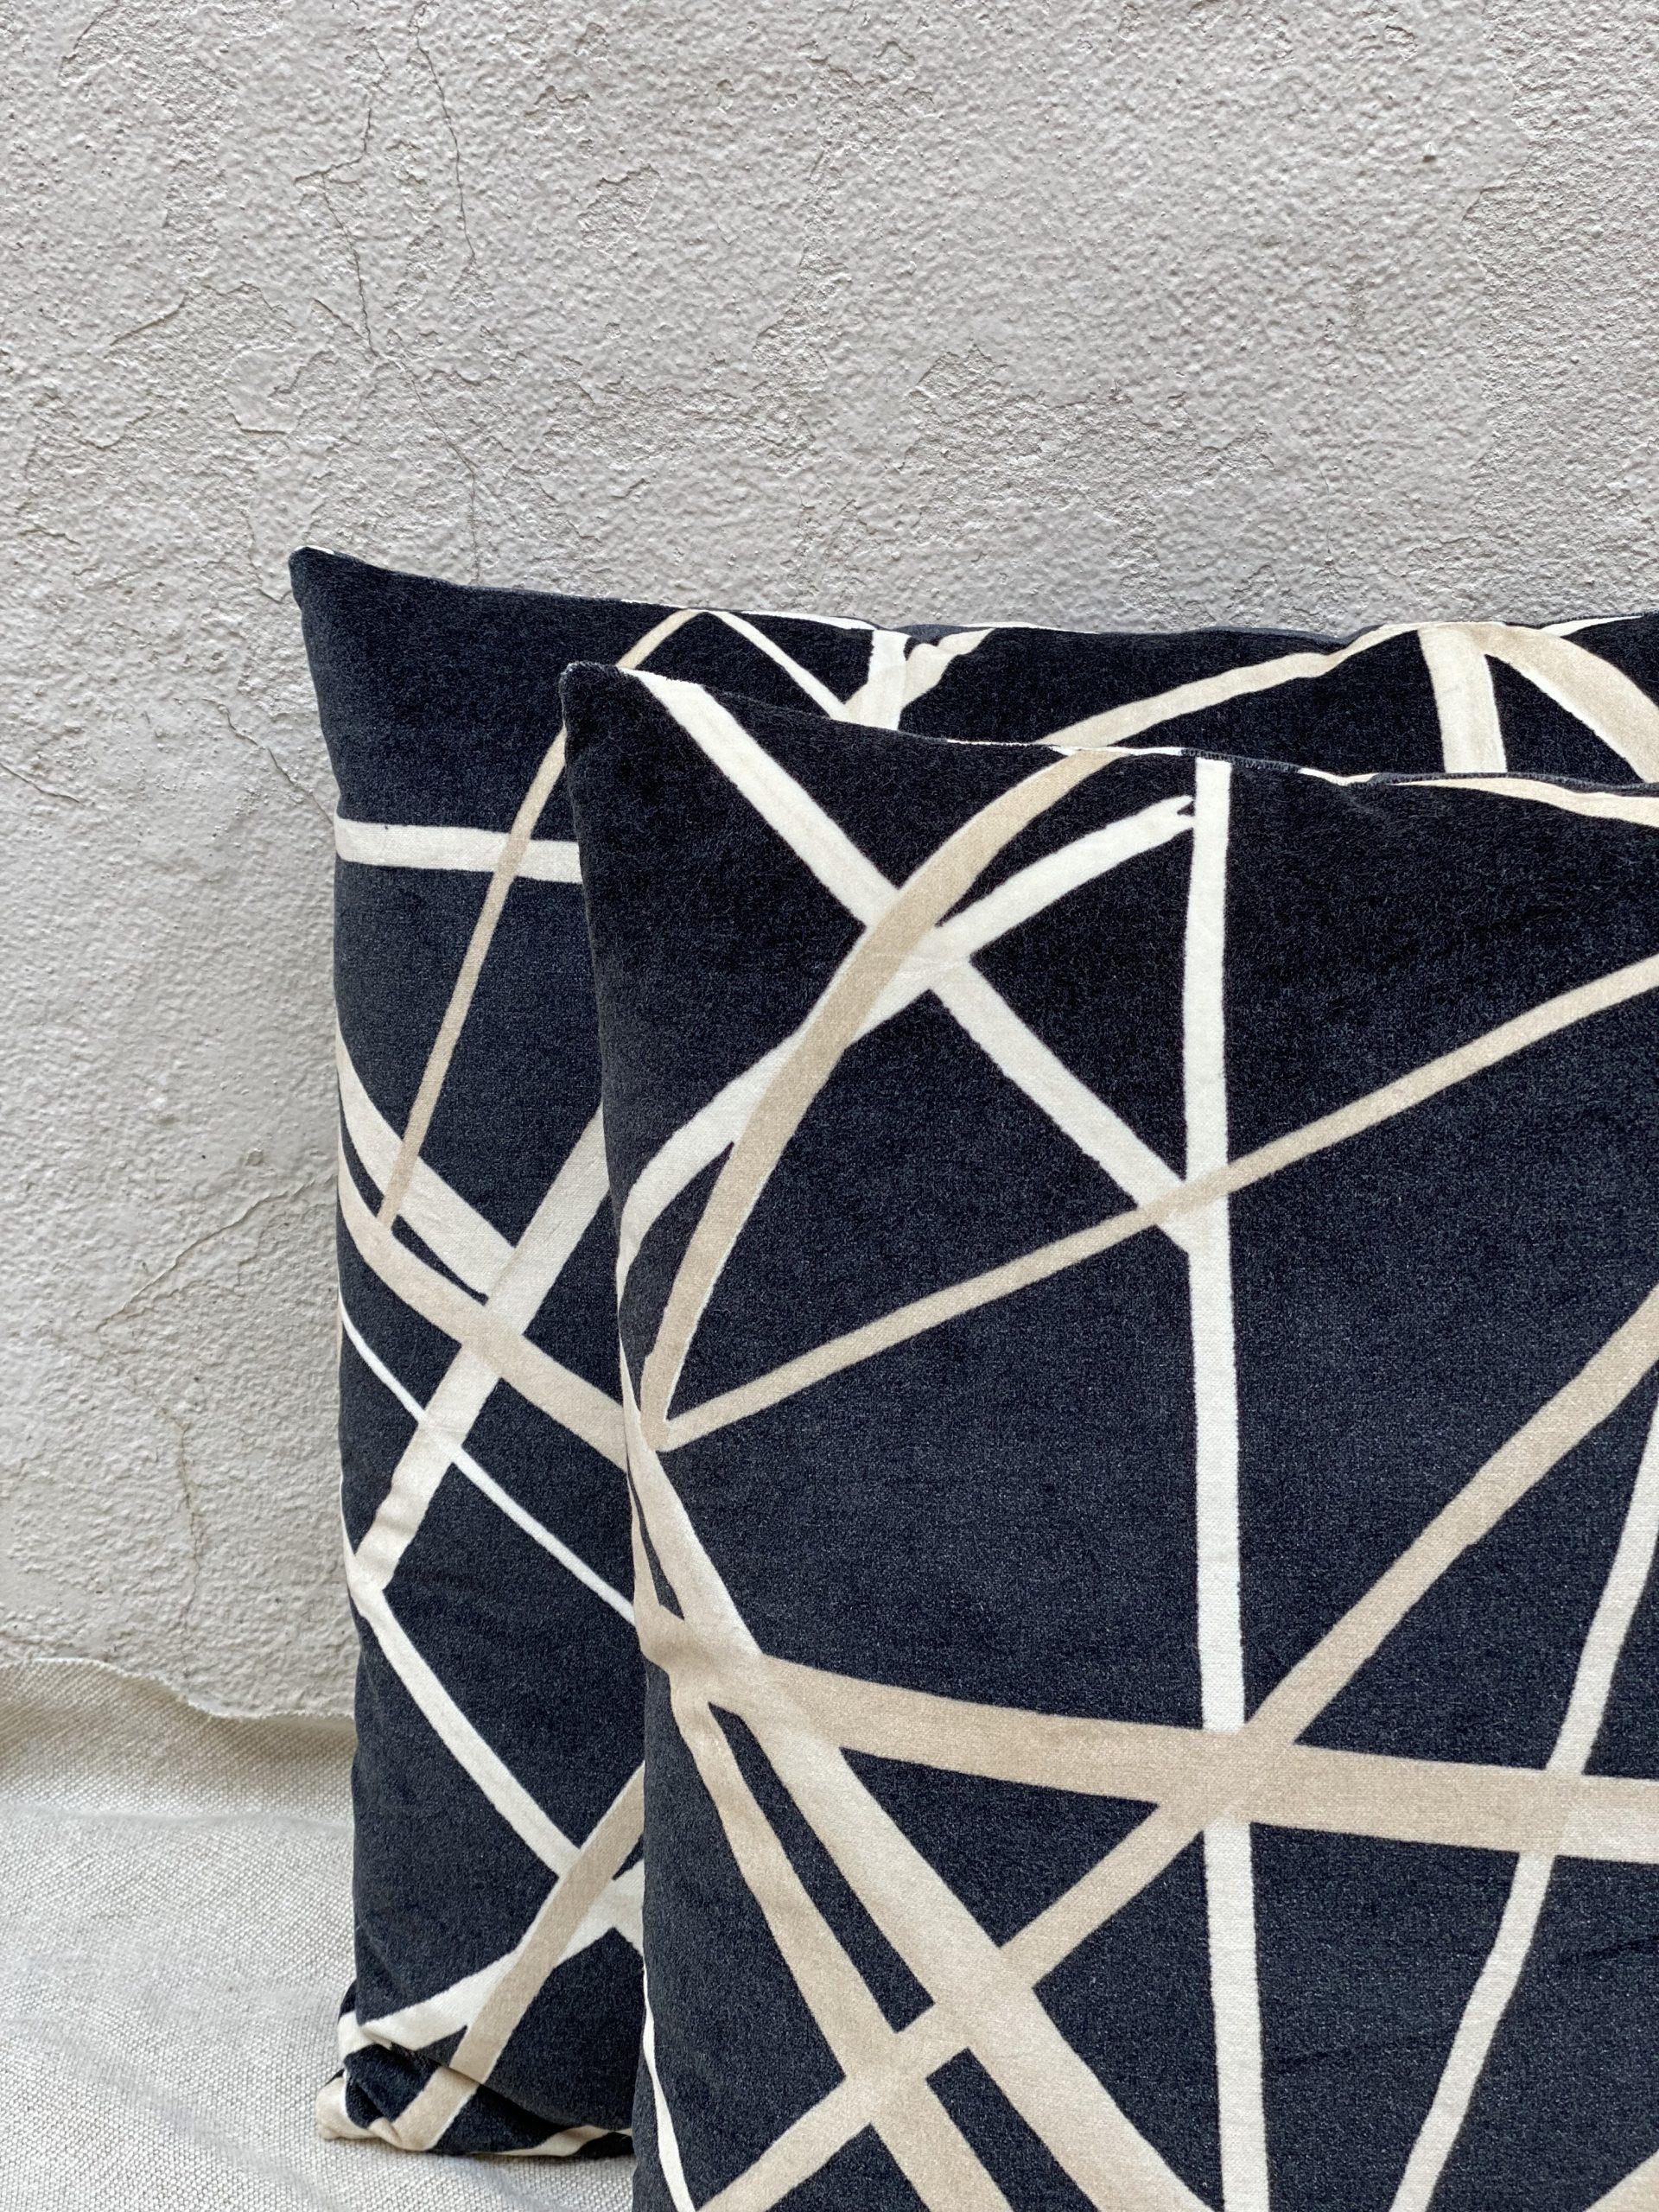 JLA Designs Pillows